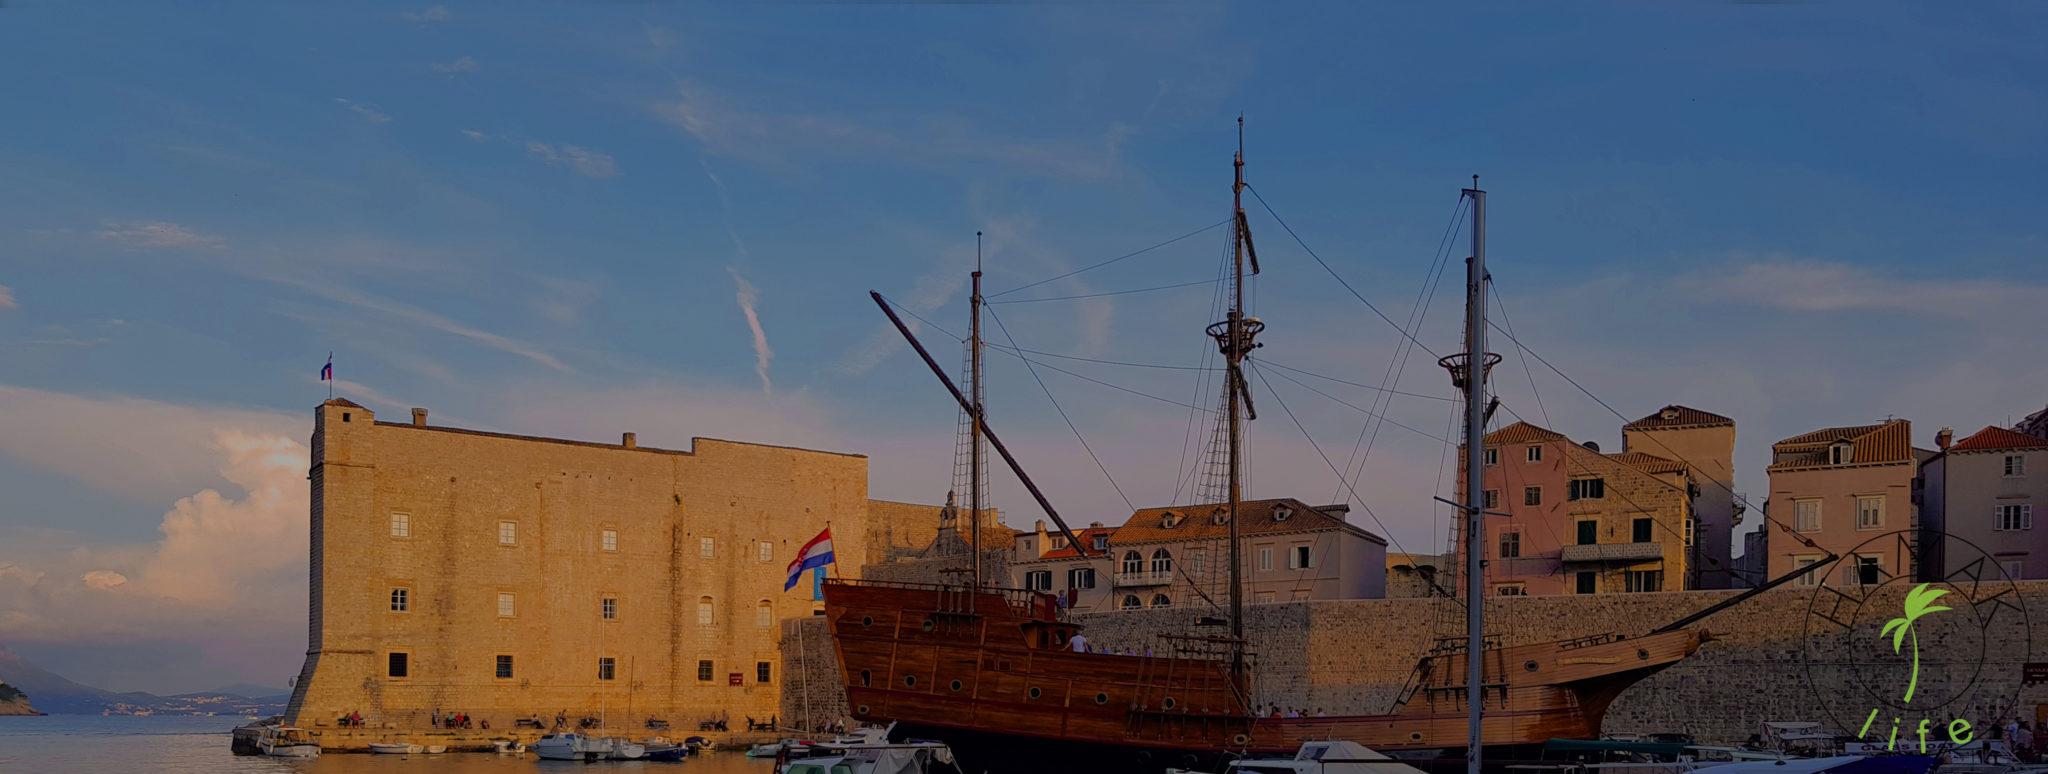 Dubrownik port